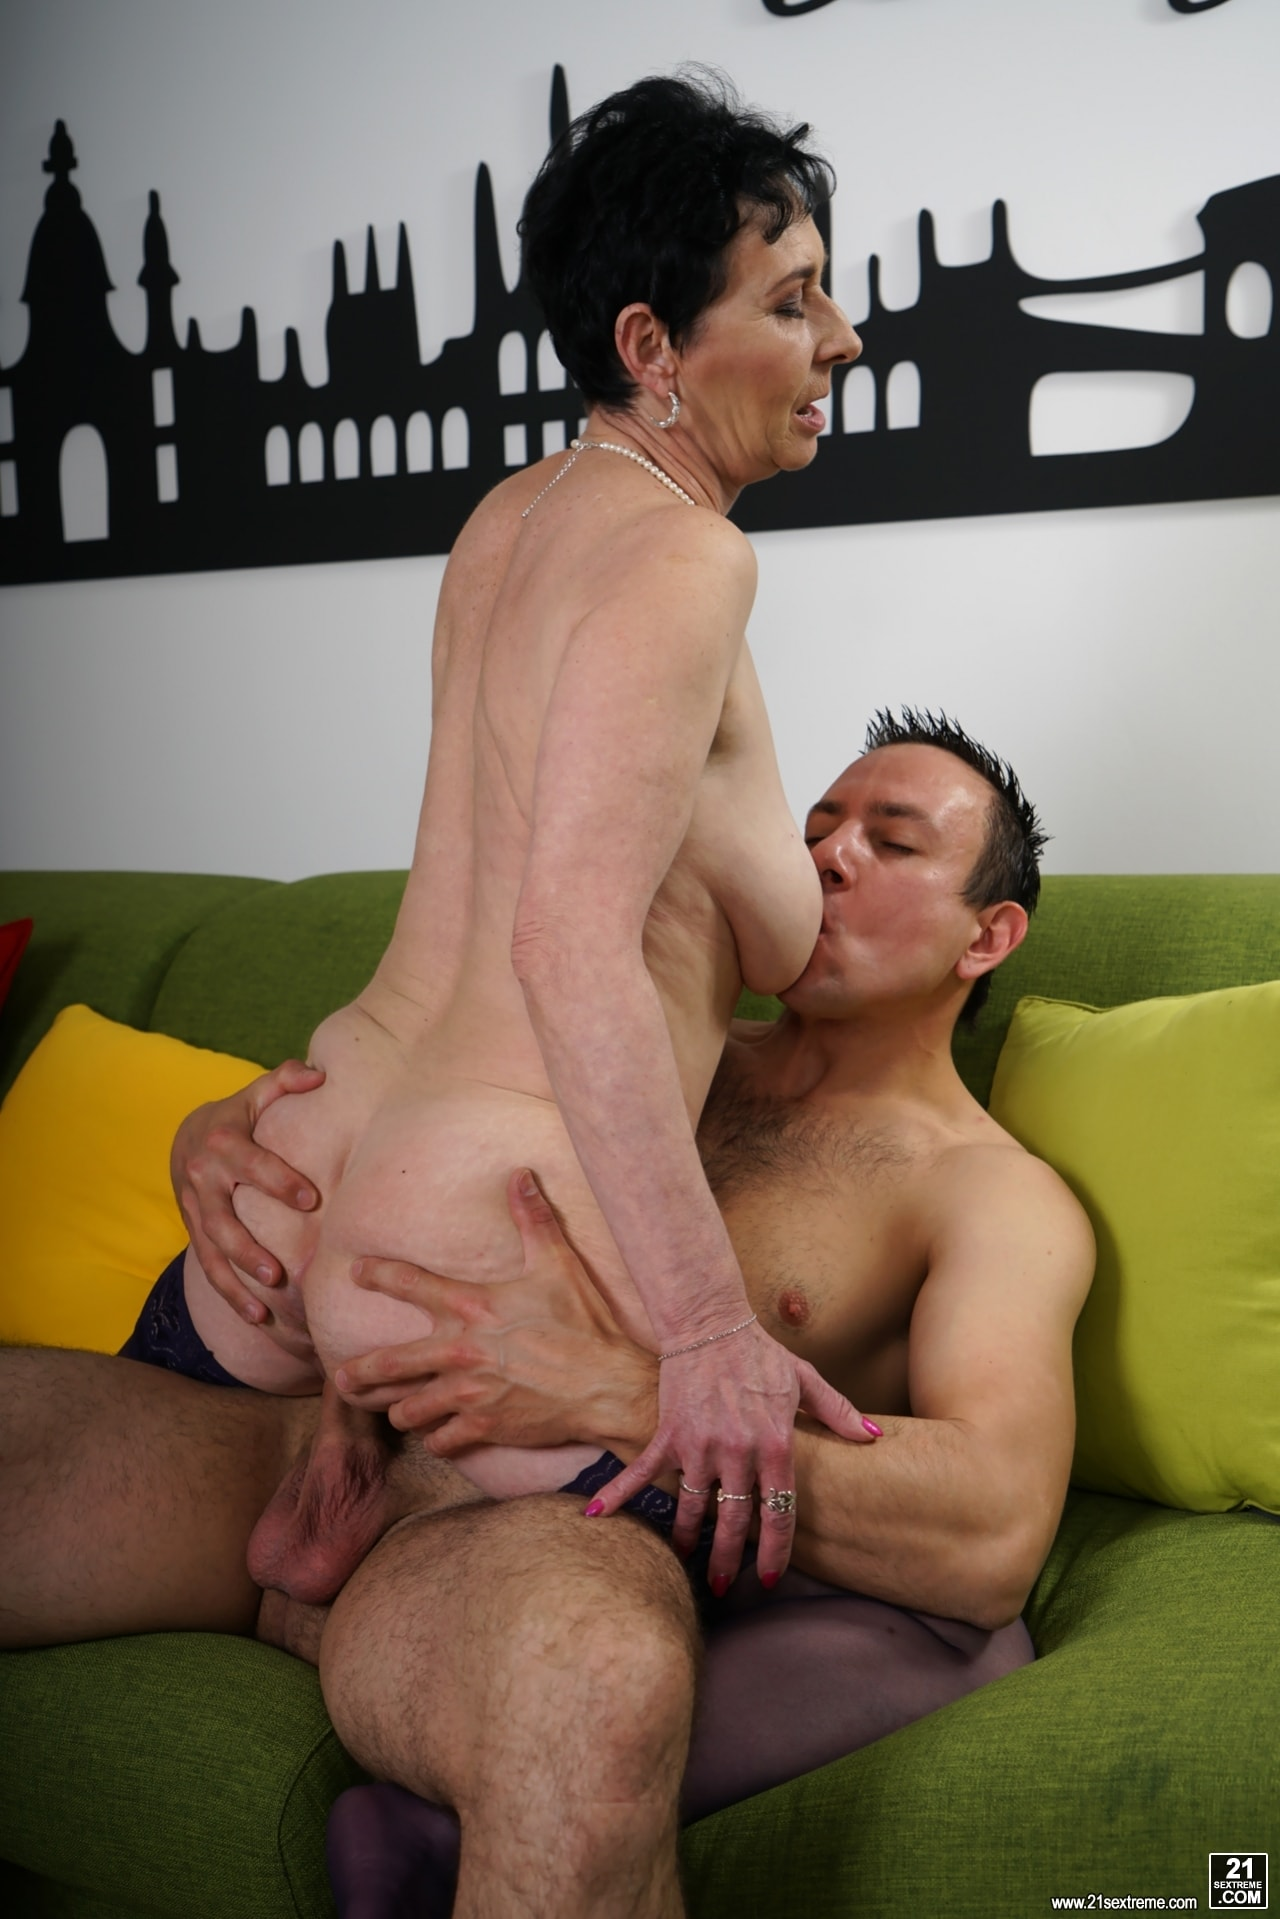 21Sextury 'Lust For Pixie' starring Pixie (Photo 160)